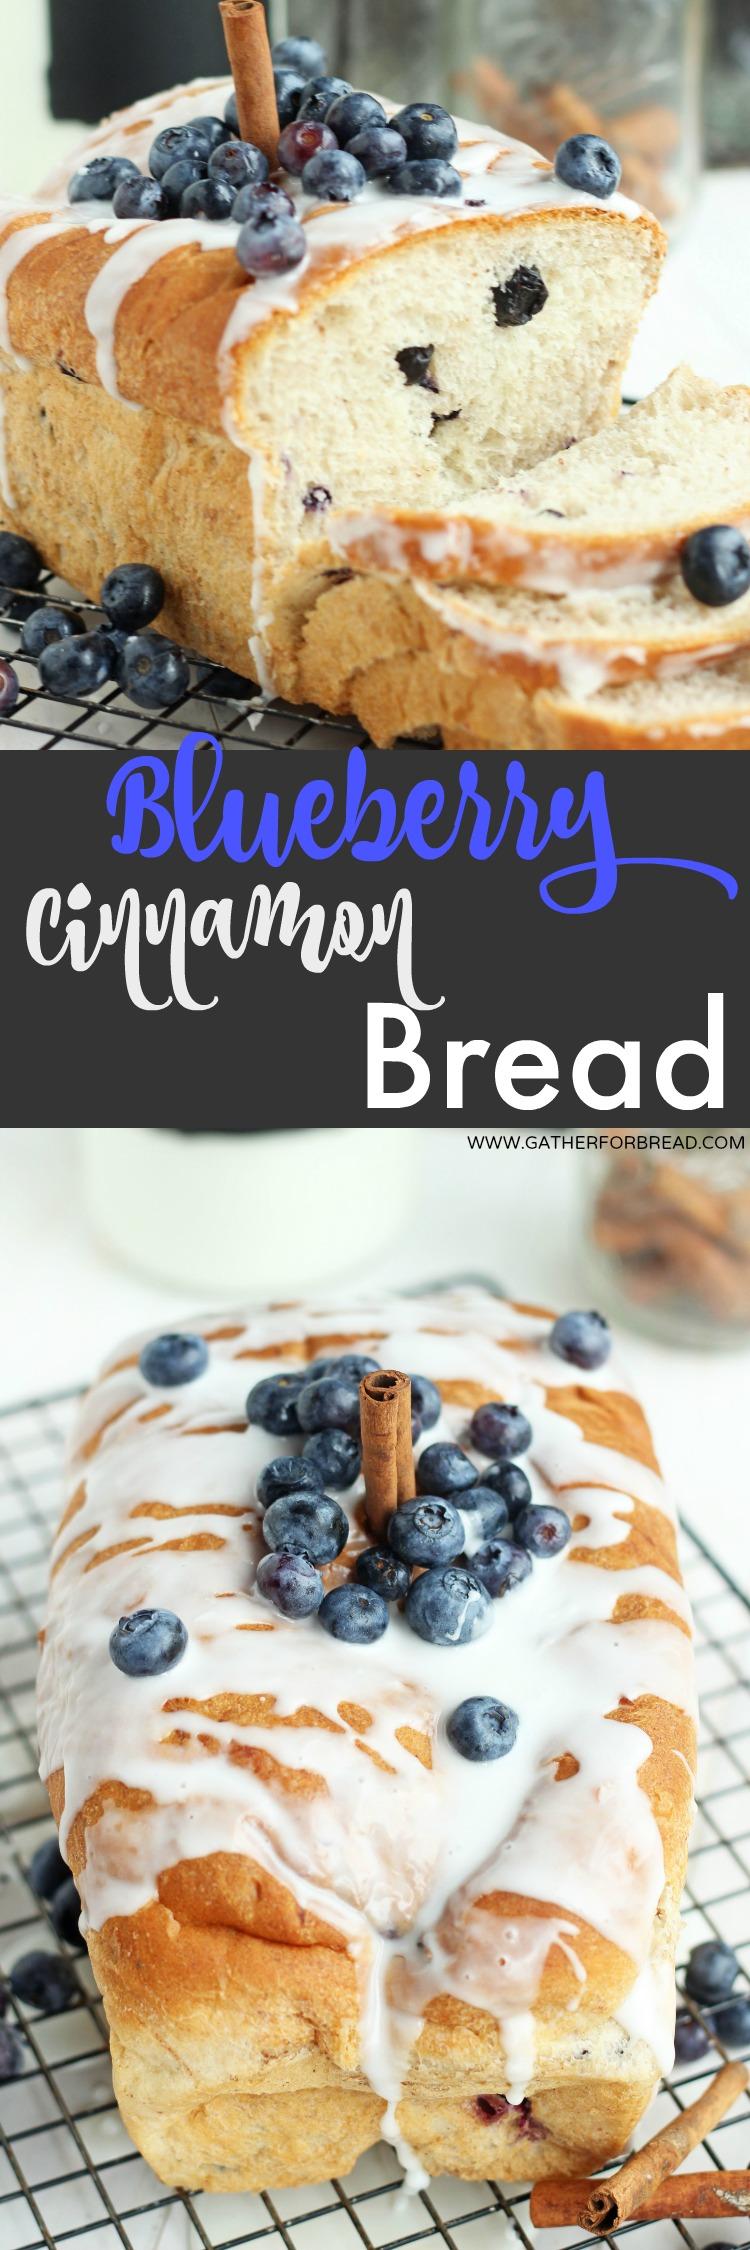 Blueberry Cinnamon Bread